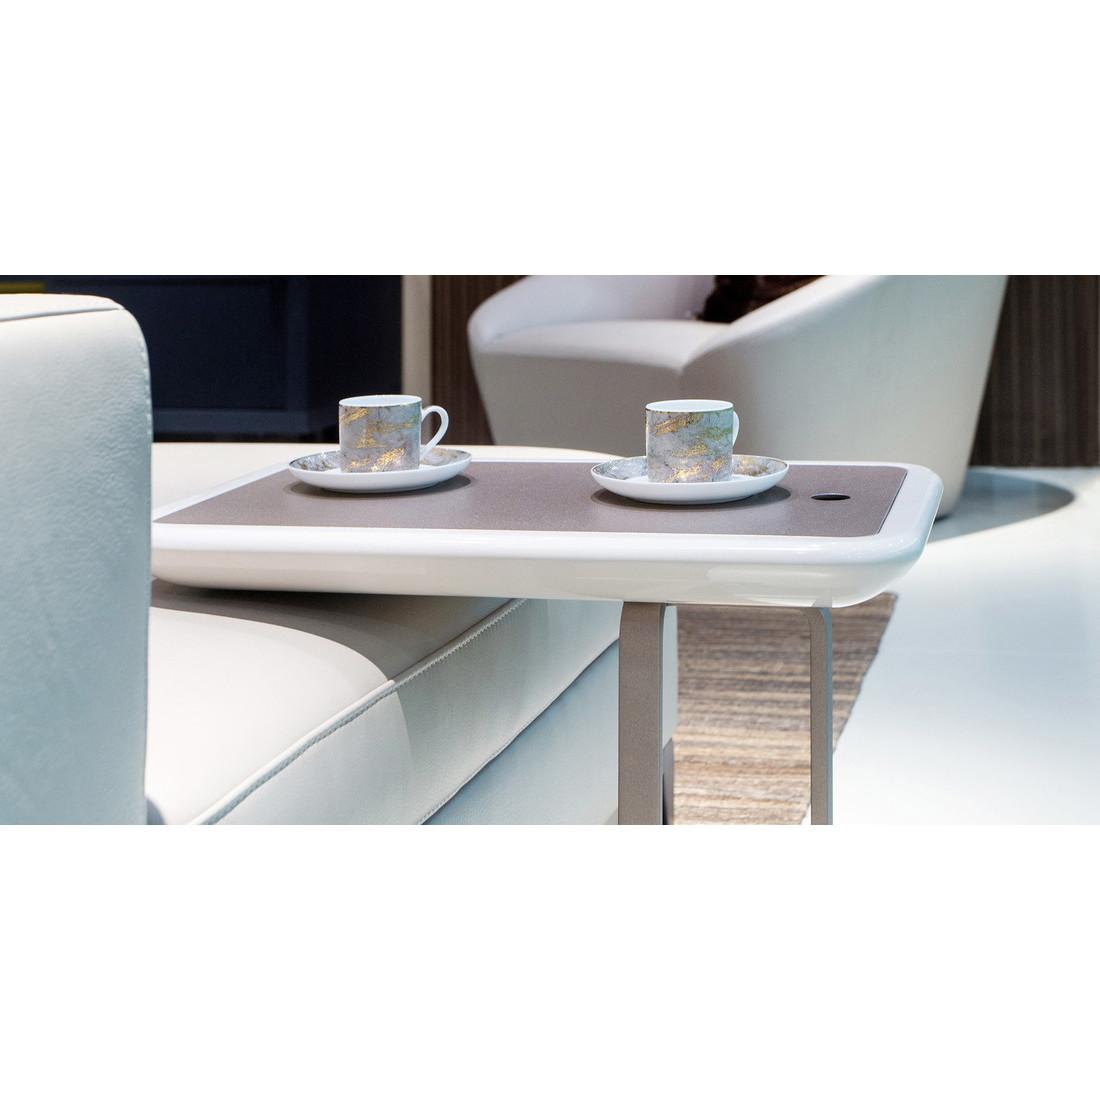 argo-furniture-alleno-end-table-dfk72-j